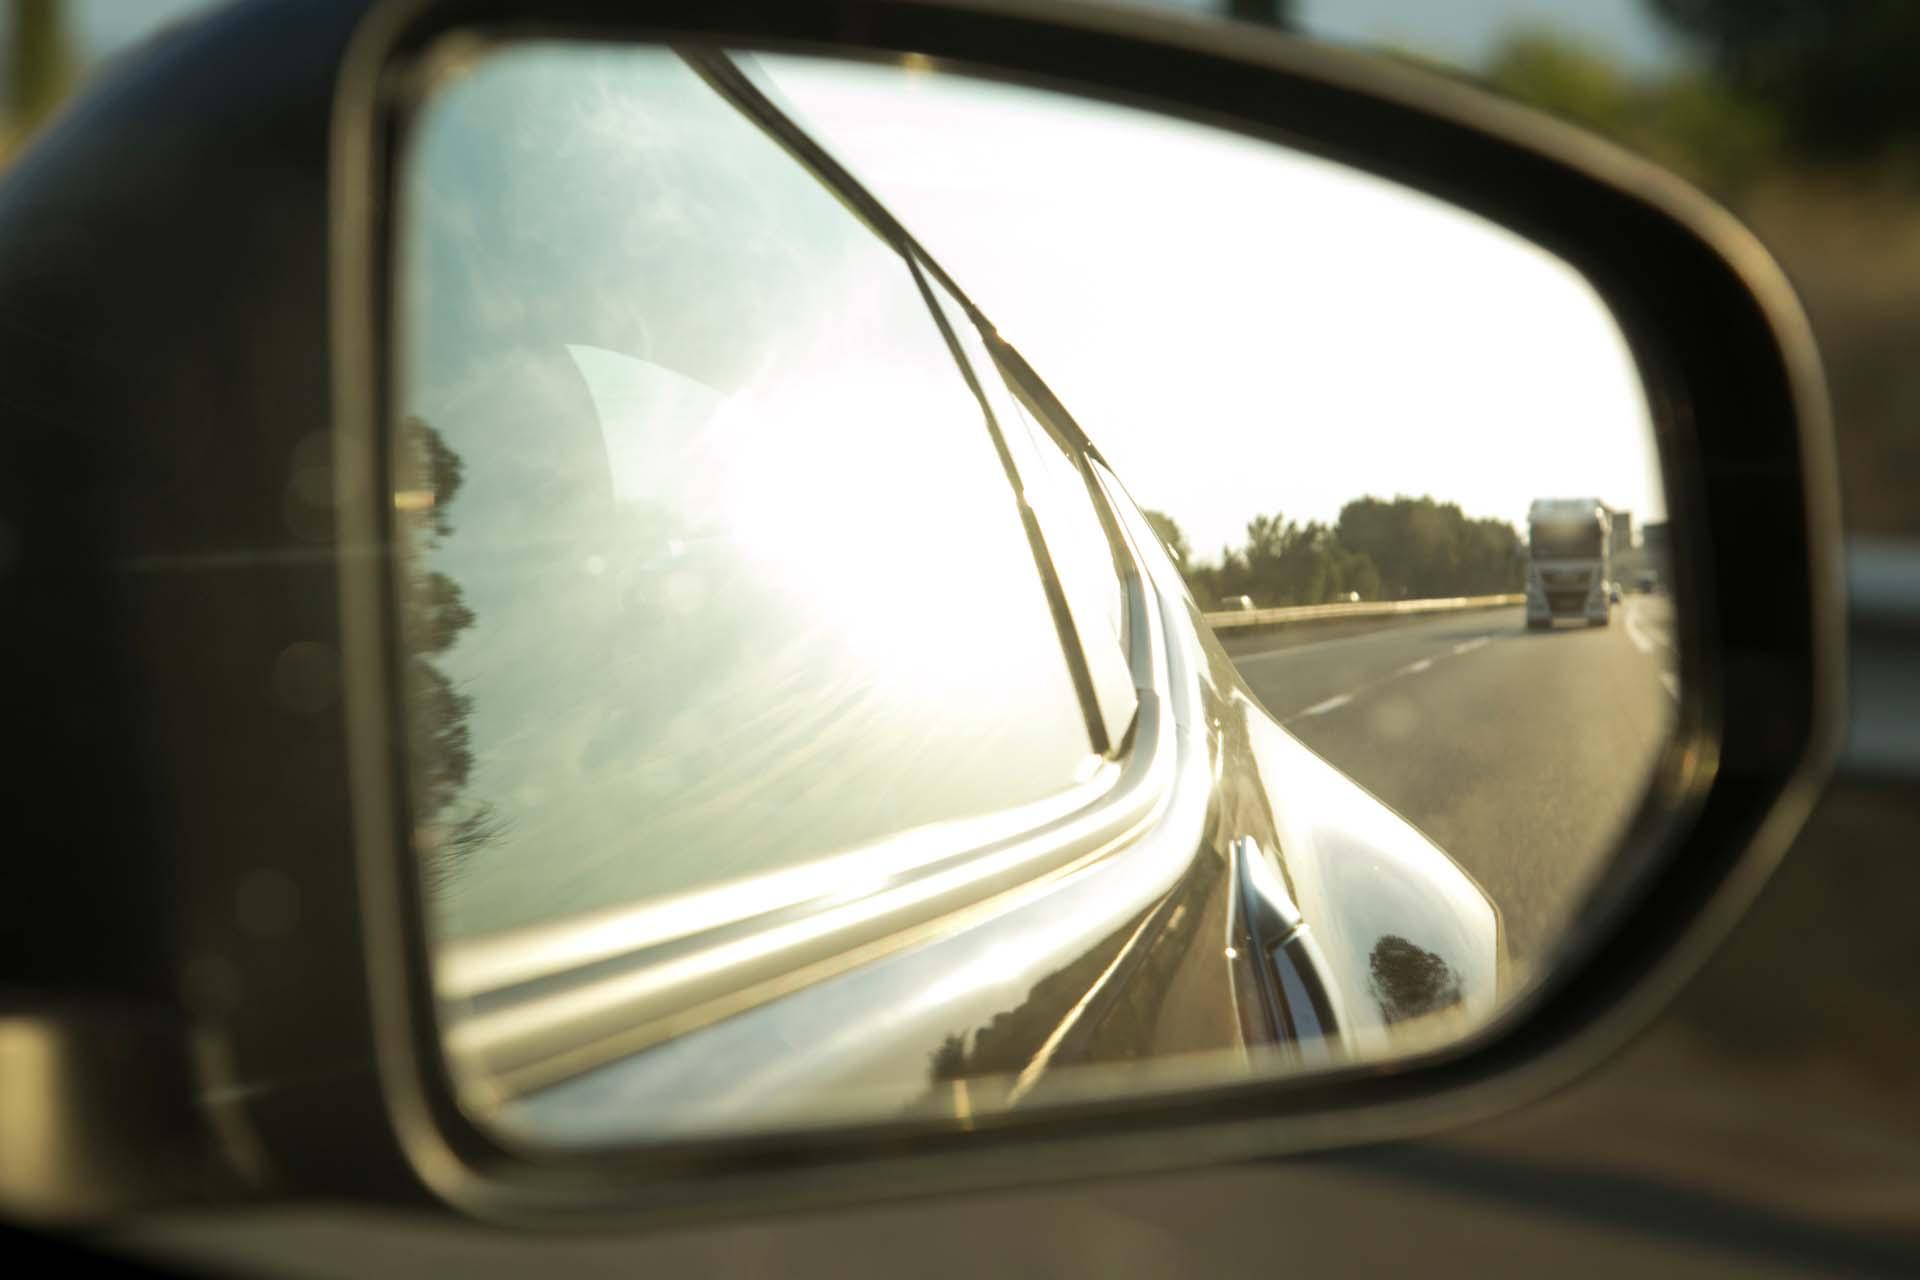 2016 Nissan 370Z European Road Trip